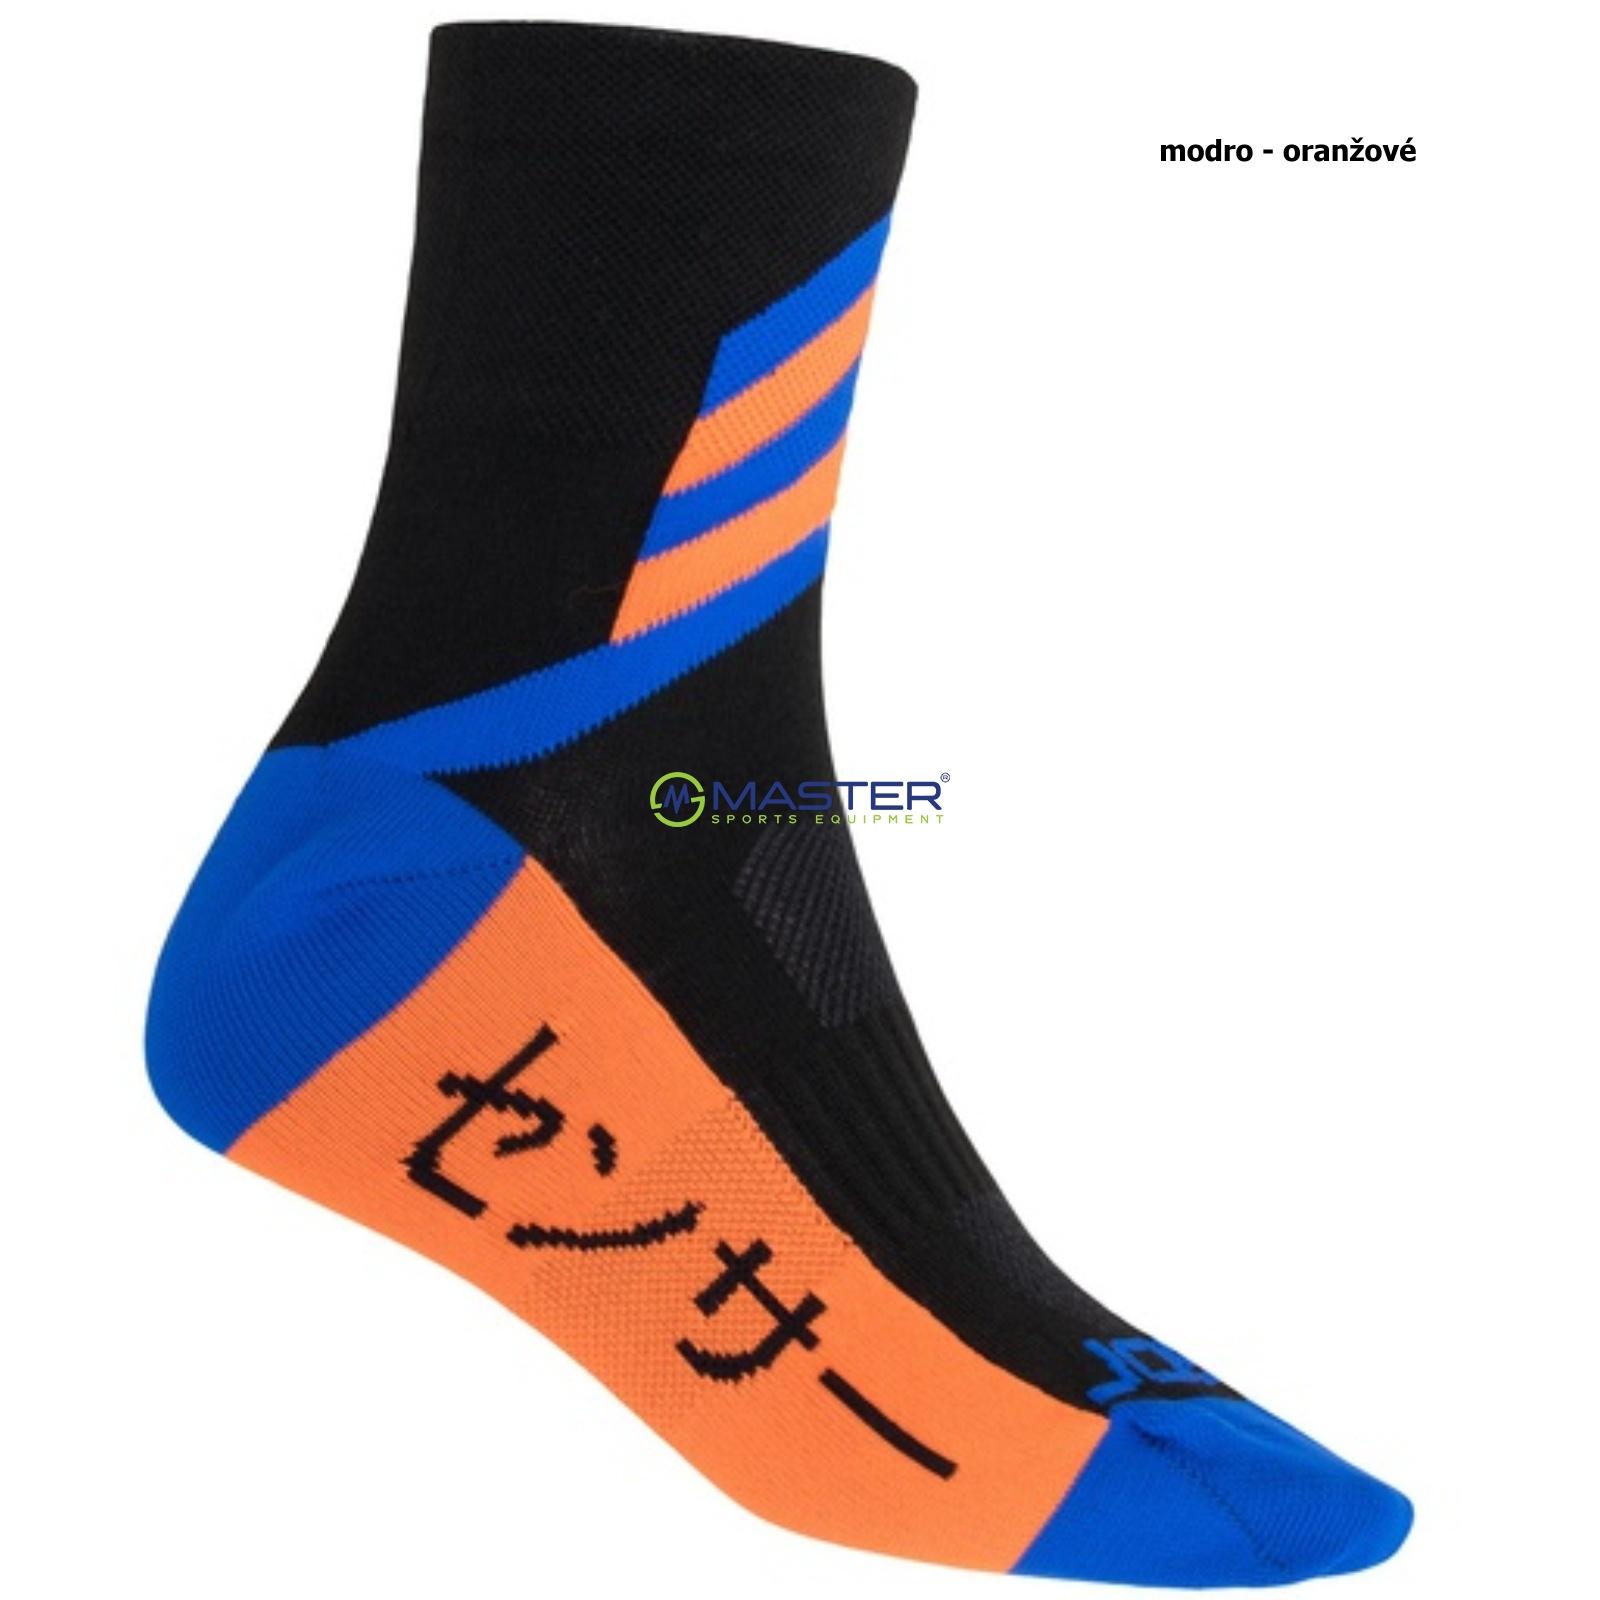 50d8cc209cd Ponožky SENSOR Tokyo modro-oranžové - vel. 9-11